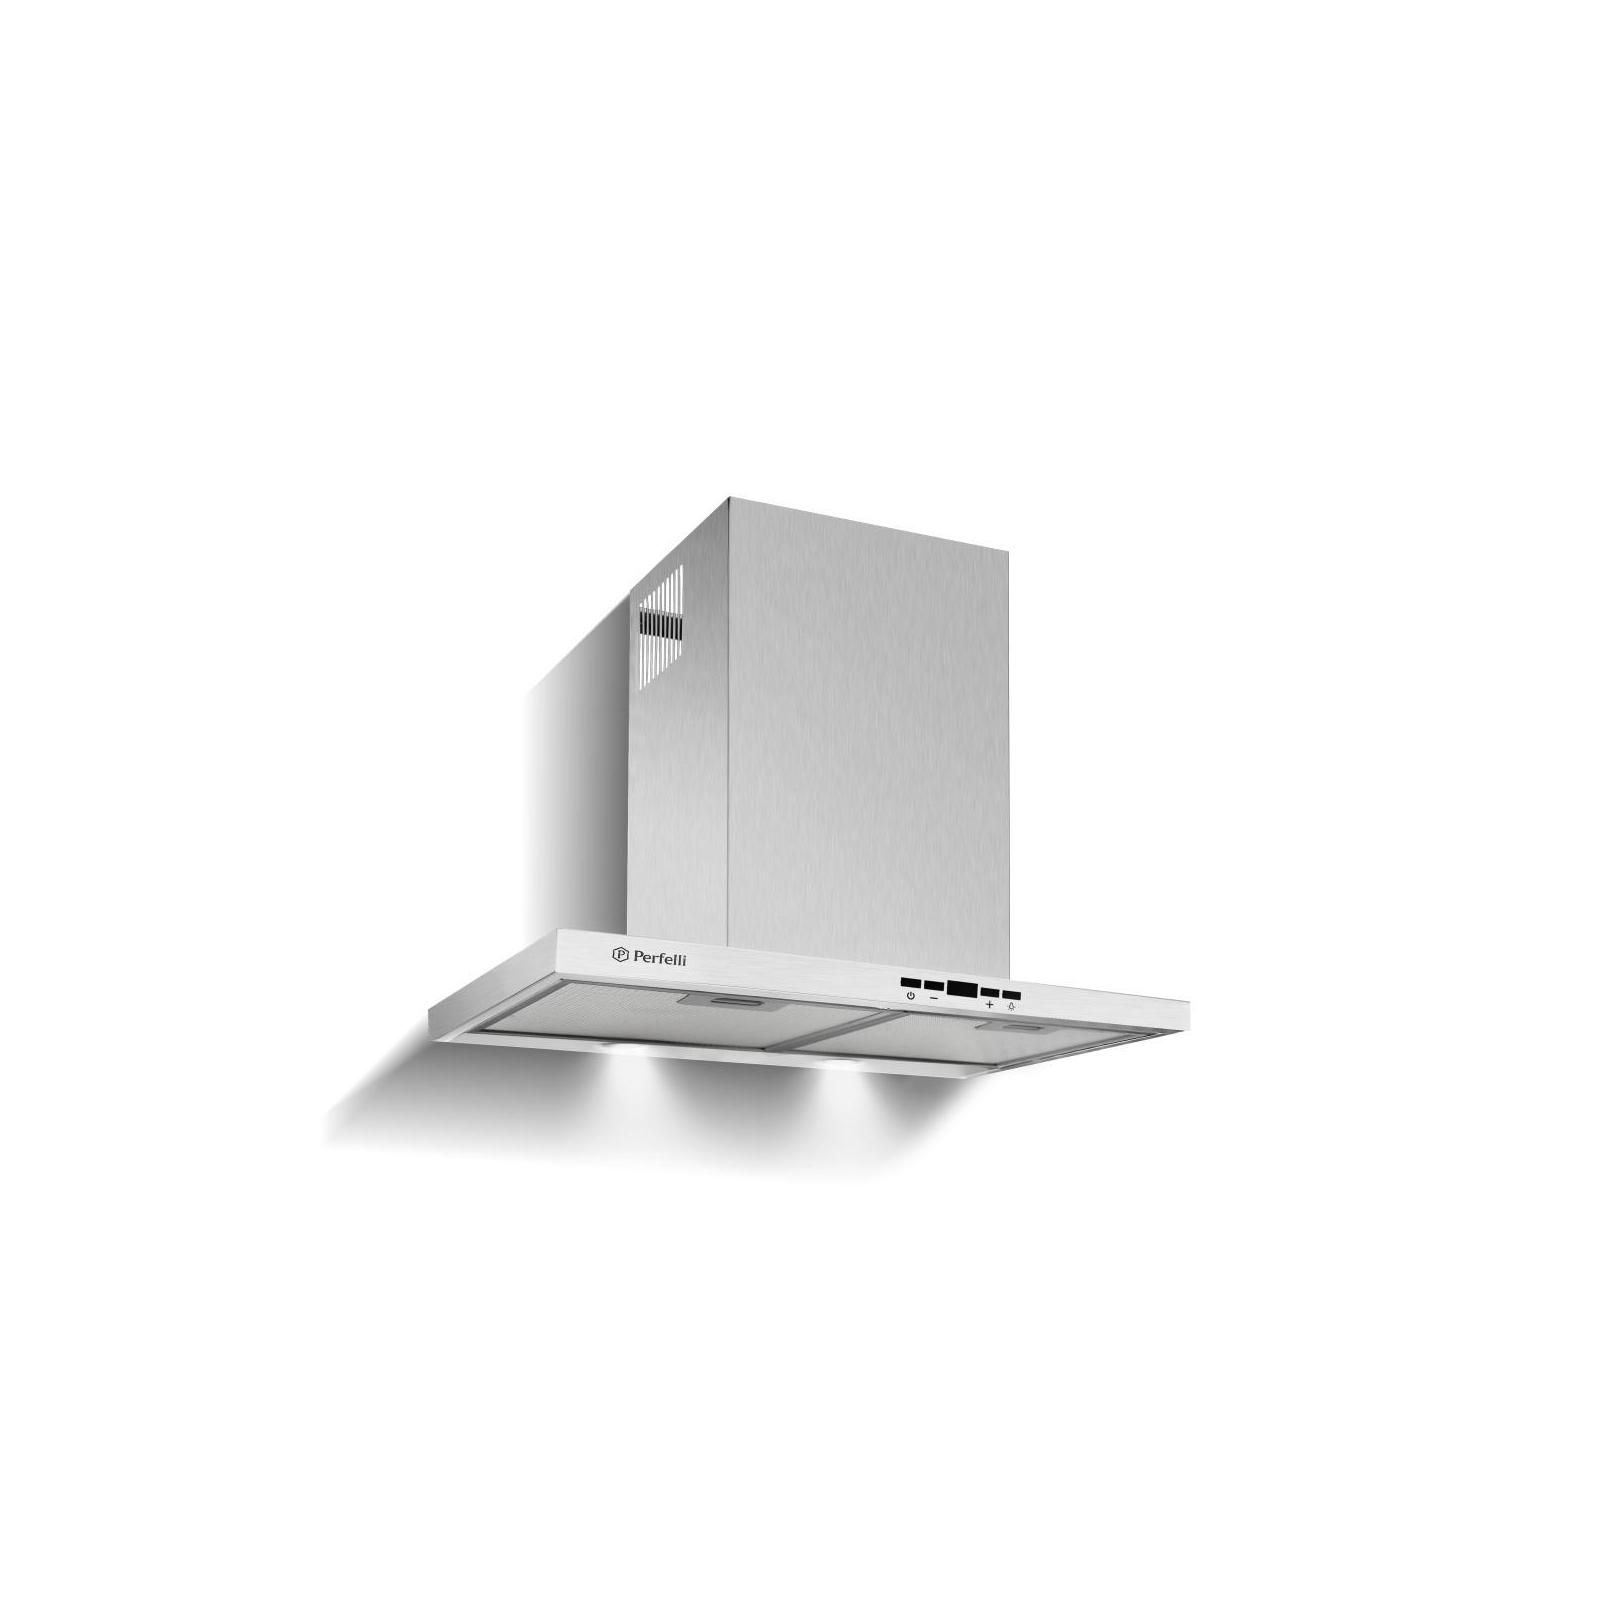 Вытяжка кухонная PERFELLI TET 6612 A 1000 I LED изображение 3